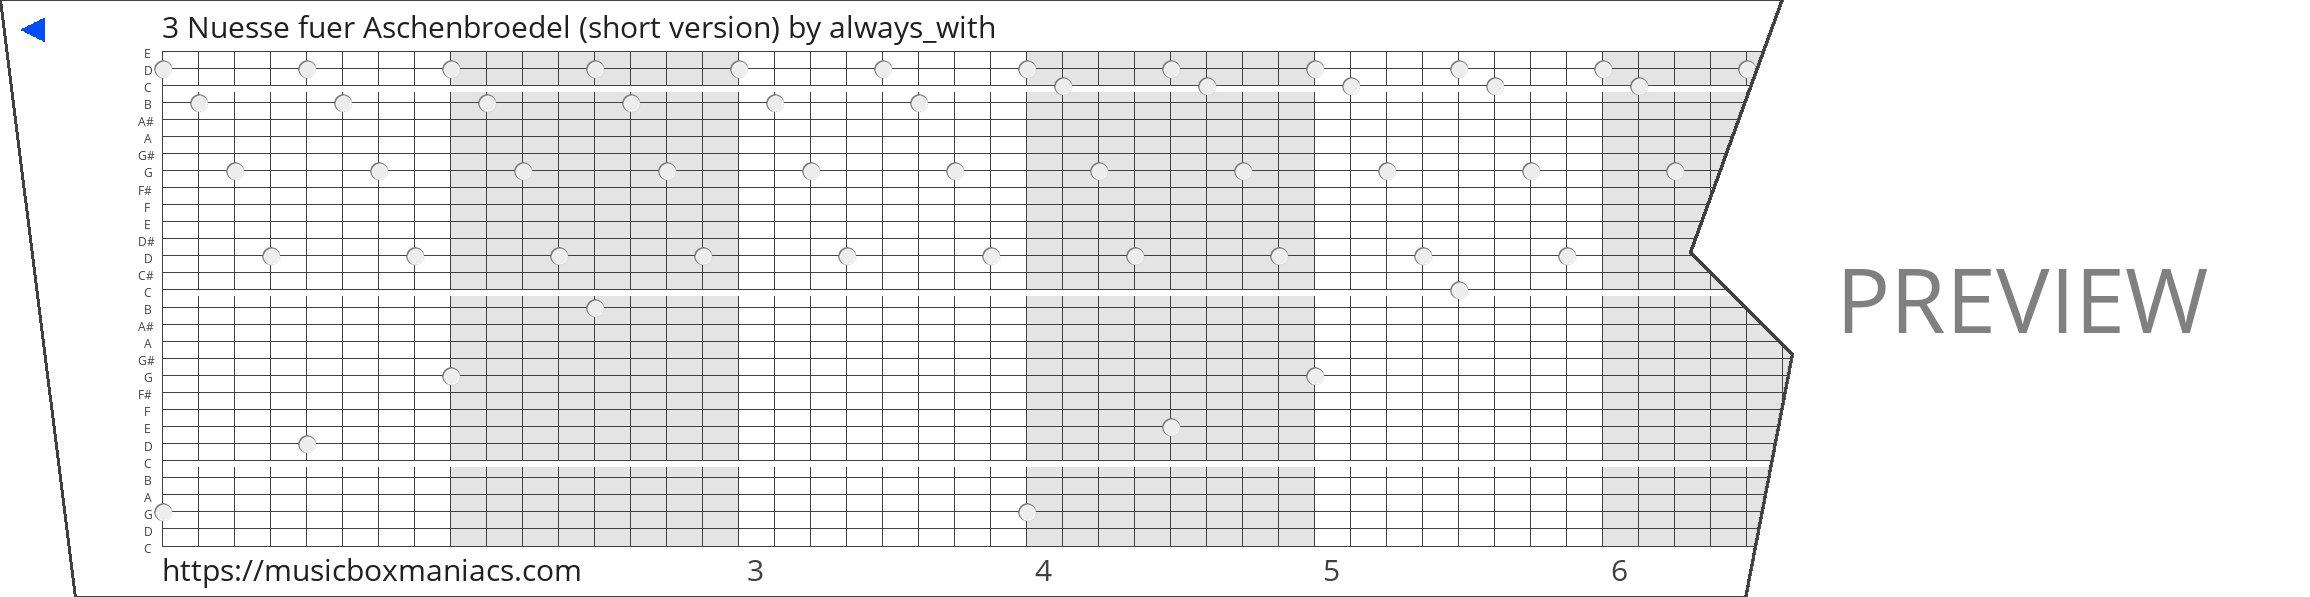 3 Nuesse fuer Aschenbroedel (short version) 30 note music box paper strip